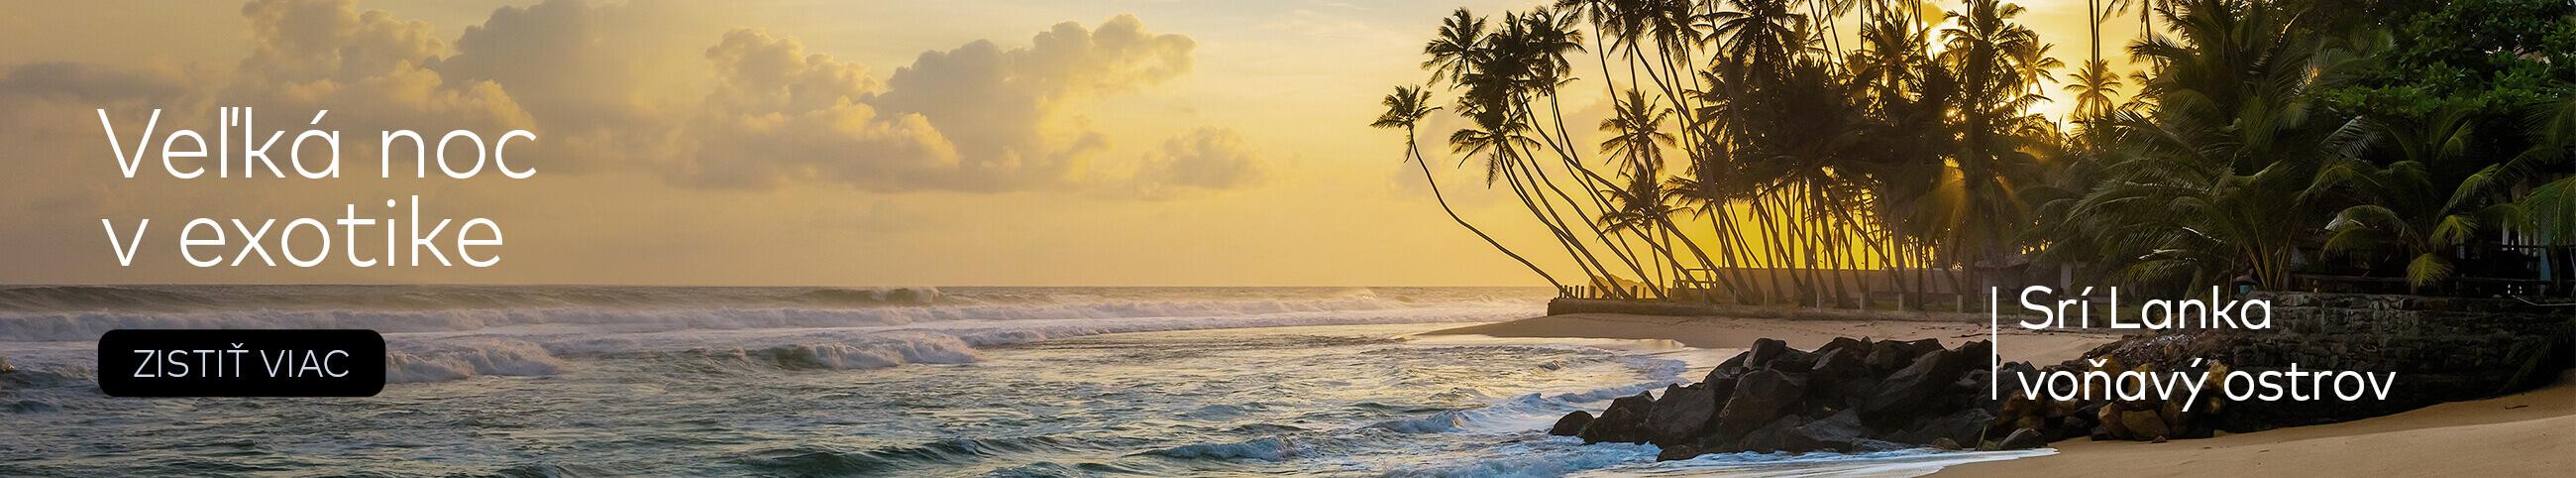 Dovolenka cez Veľkú noc na Sri Lanke